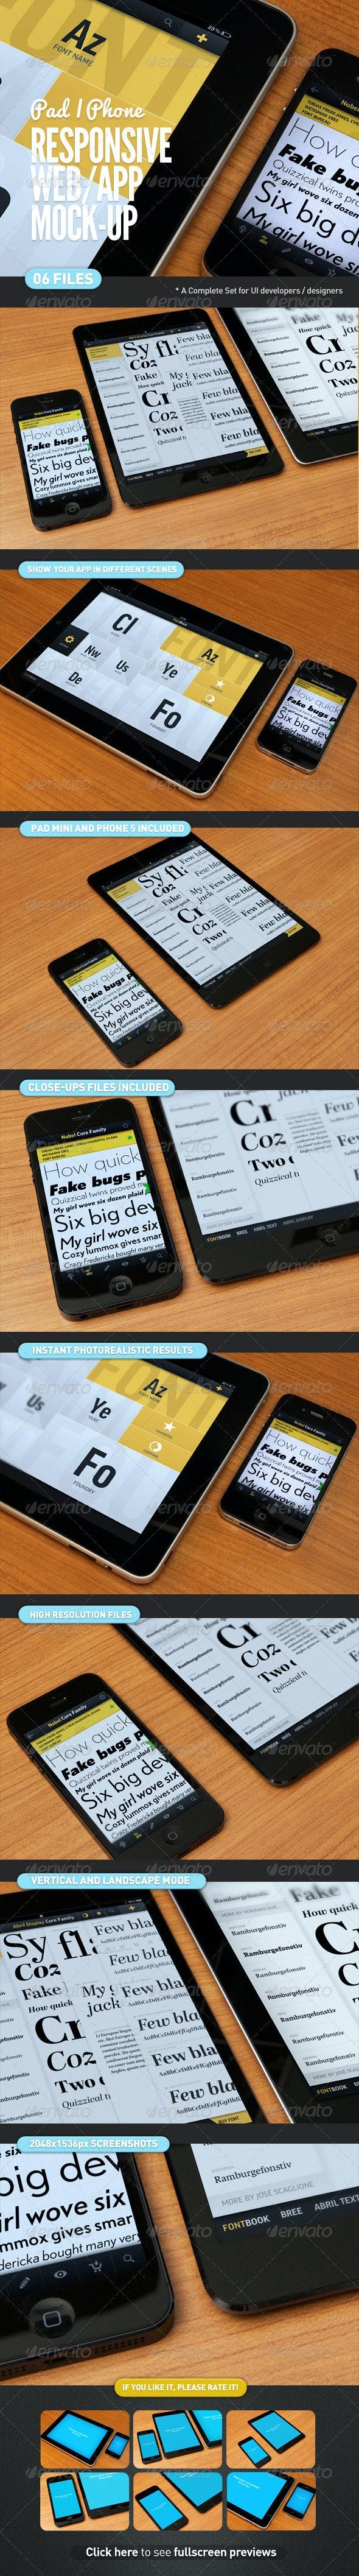 Responsive Screen Web | App Mock-Up - Multiple Displays